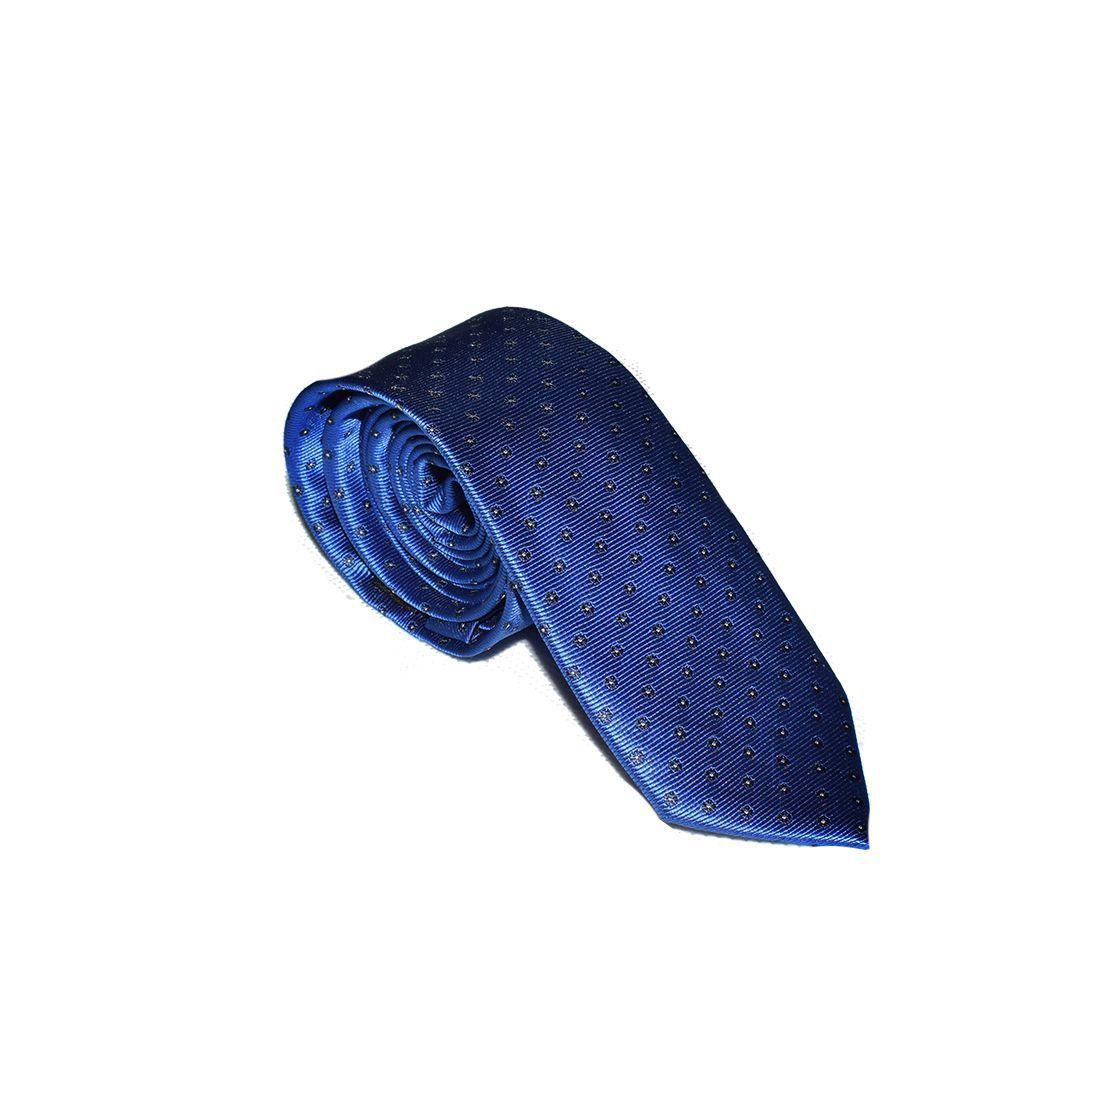 Gravata Slim Azul Royal - 100% poliéster